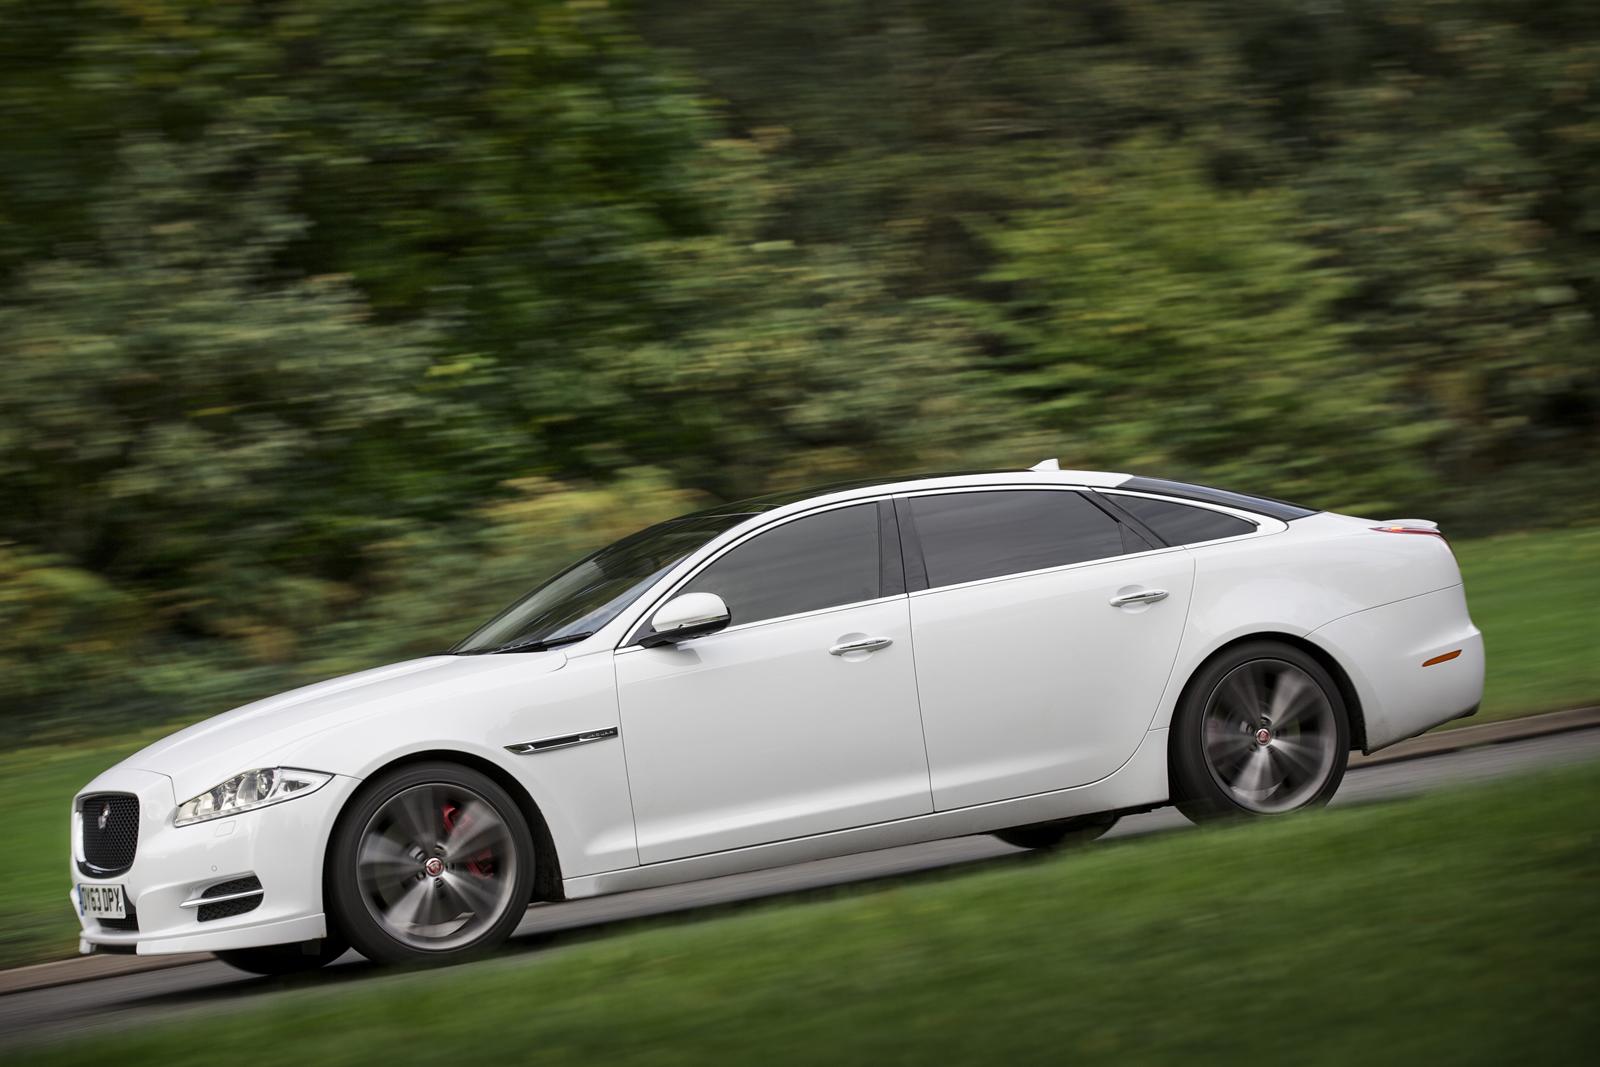 2015 Jaguar Xjl Portfolio Carfanatics Blog